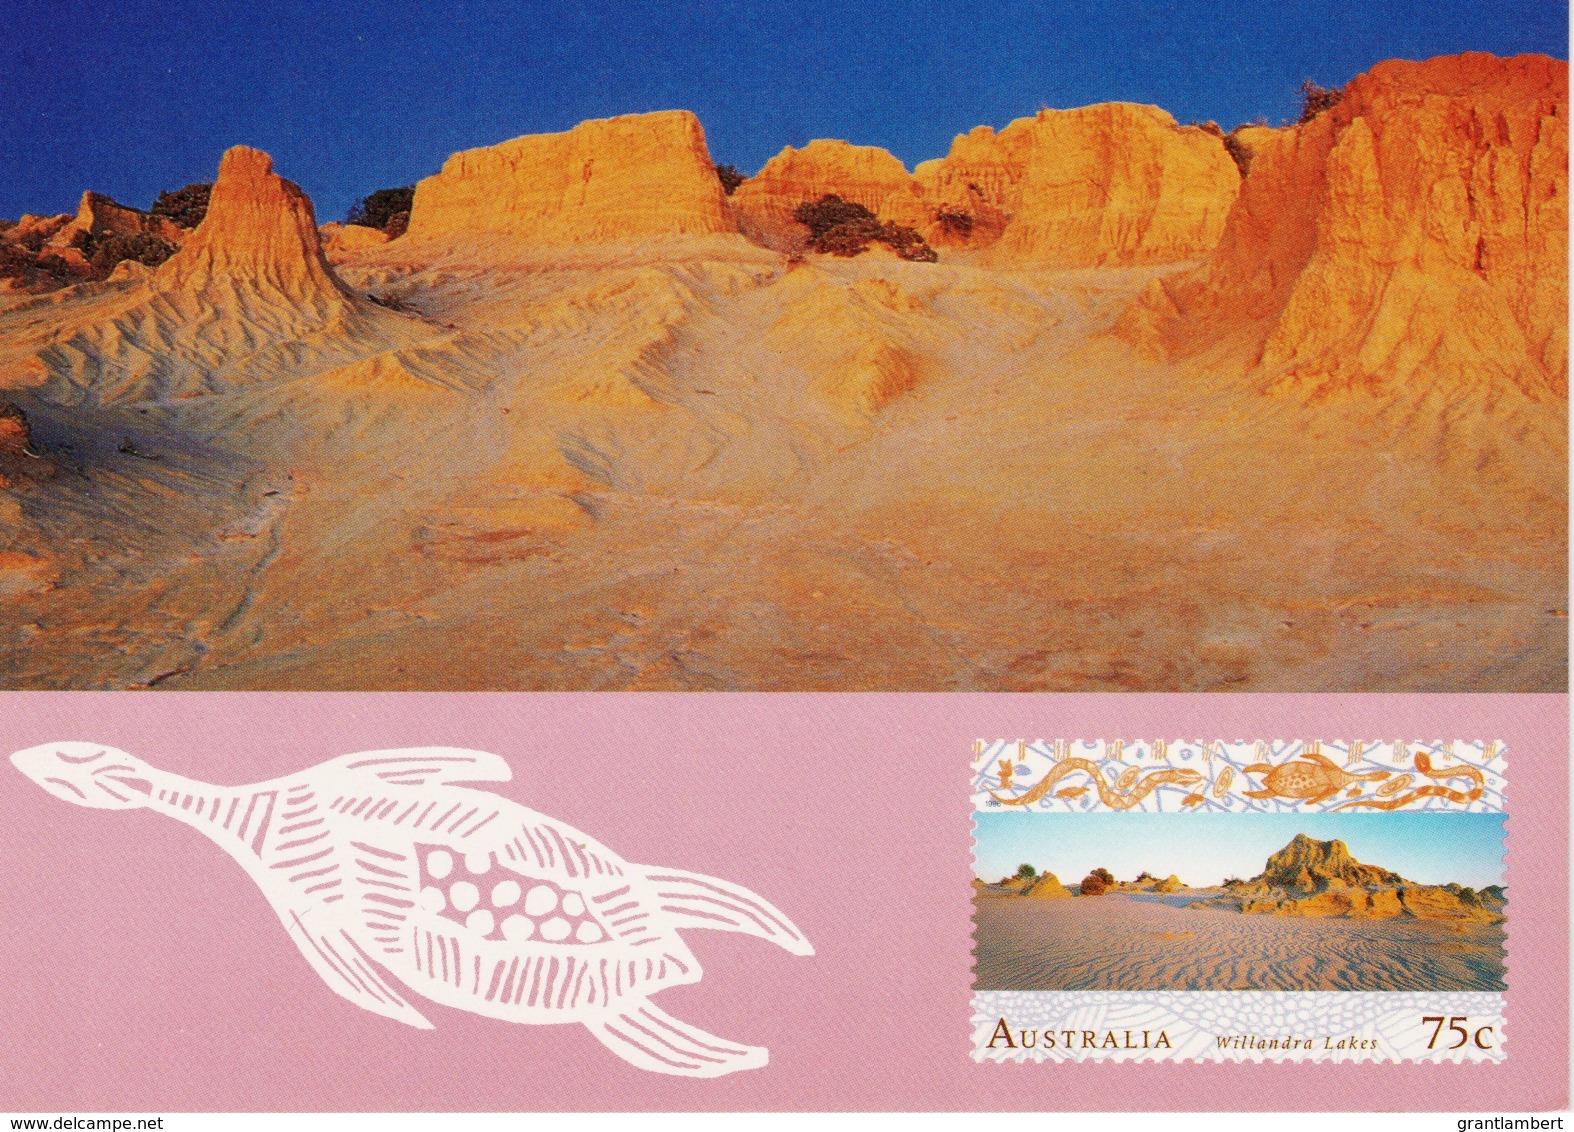 Willandra Lakes, Mungo National Park, New South Wales - Unused Prepaid Postcard - Australie